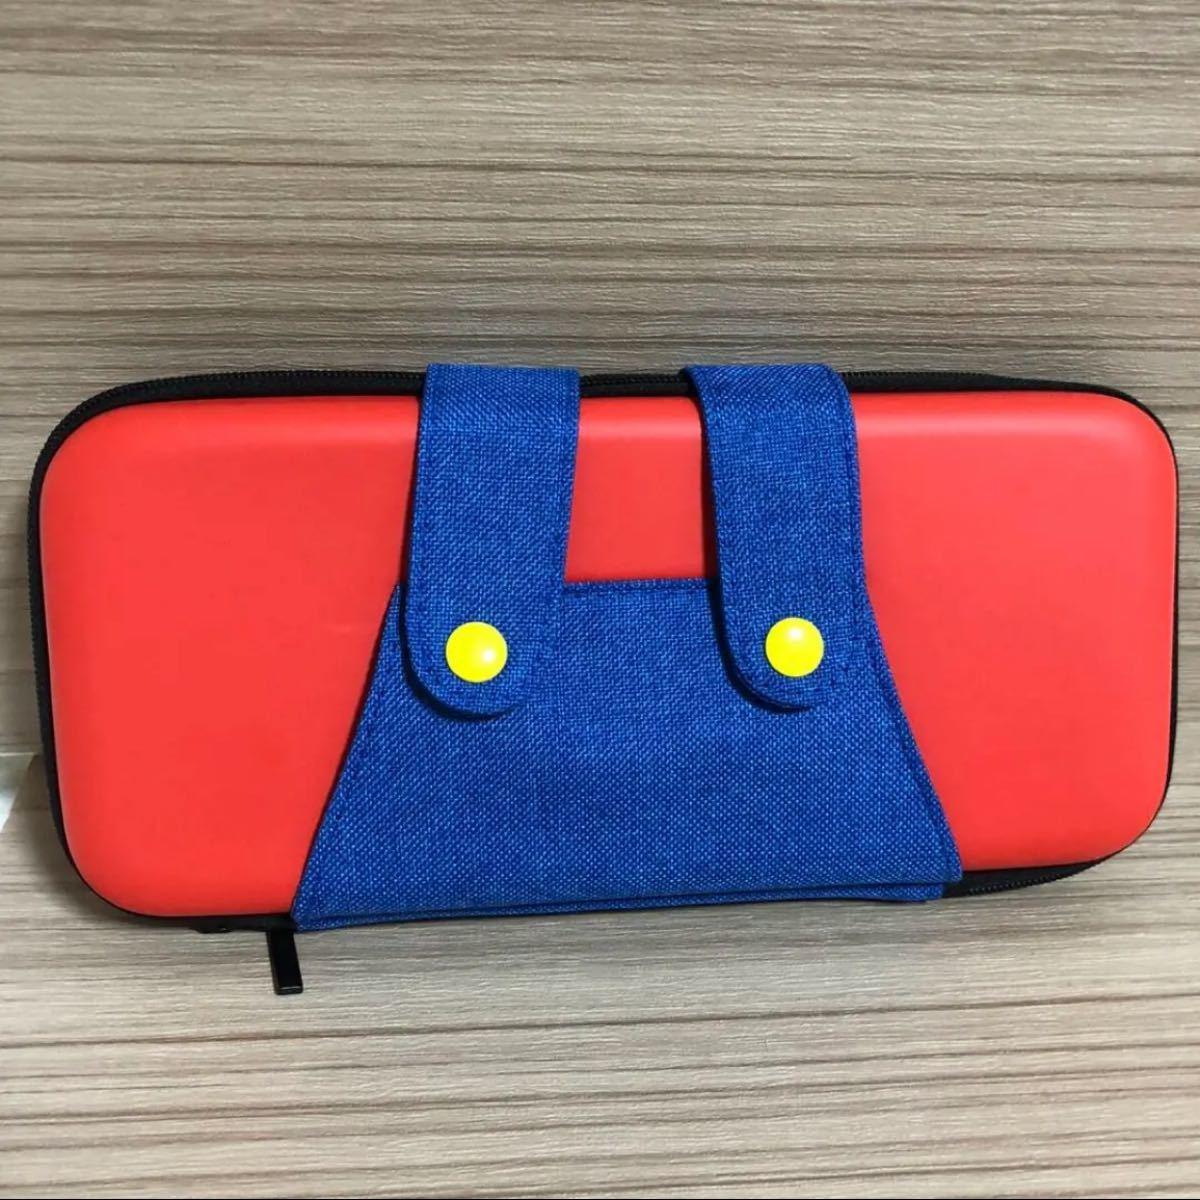 Nintendo Switch / 任天堂スイッチ 専用 マリオ風カバー 赤青